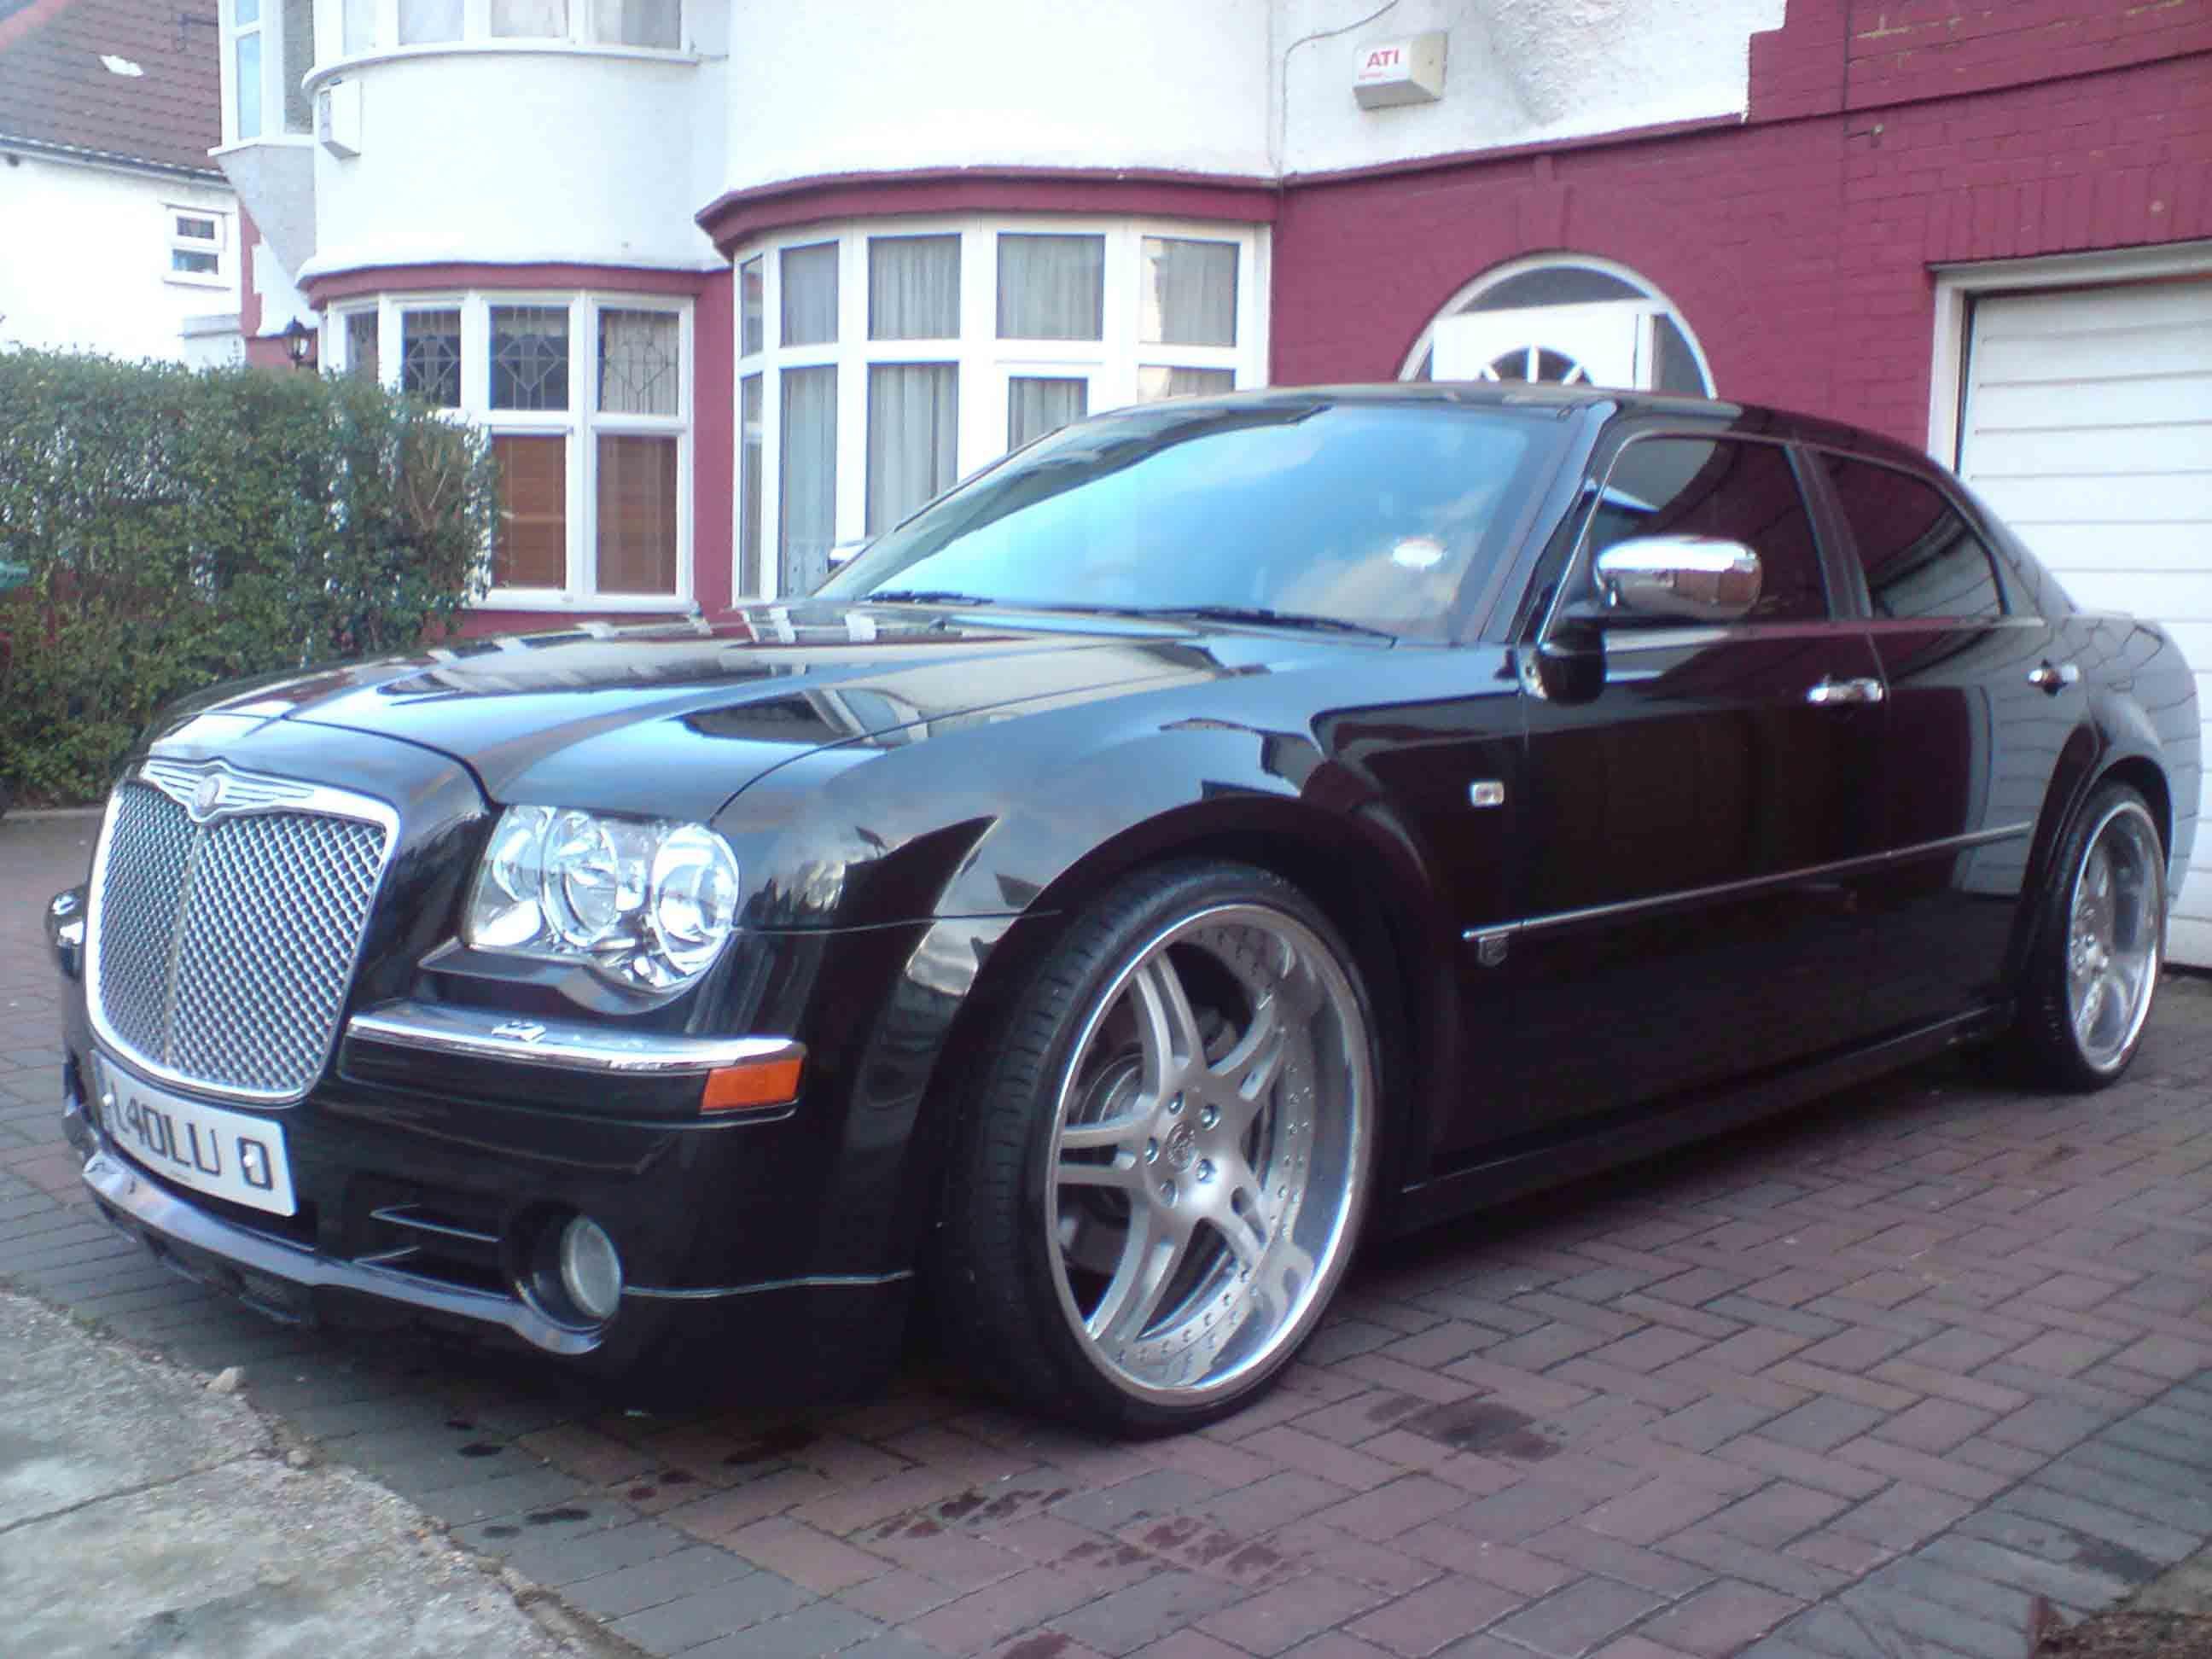 Chrysler 300c iforged classics brushed aluminium centre with polished lip split 5 star wheels